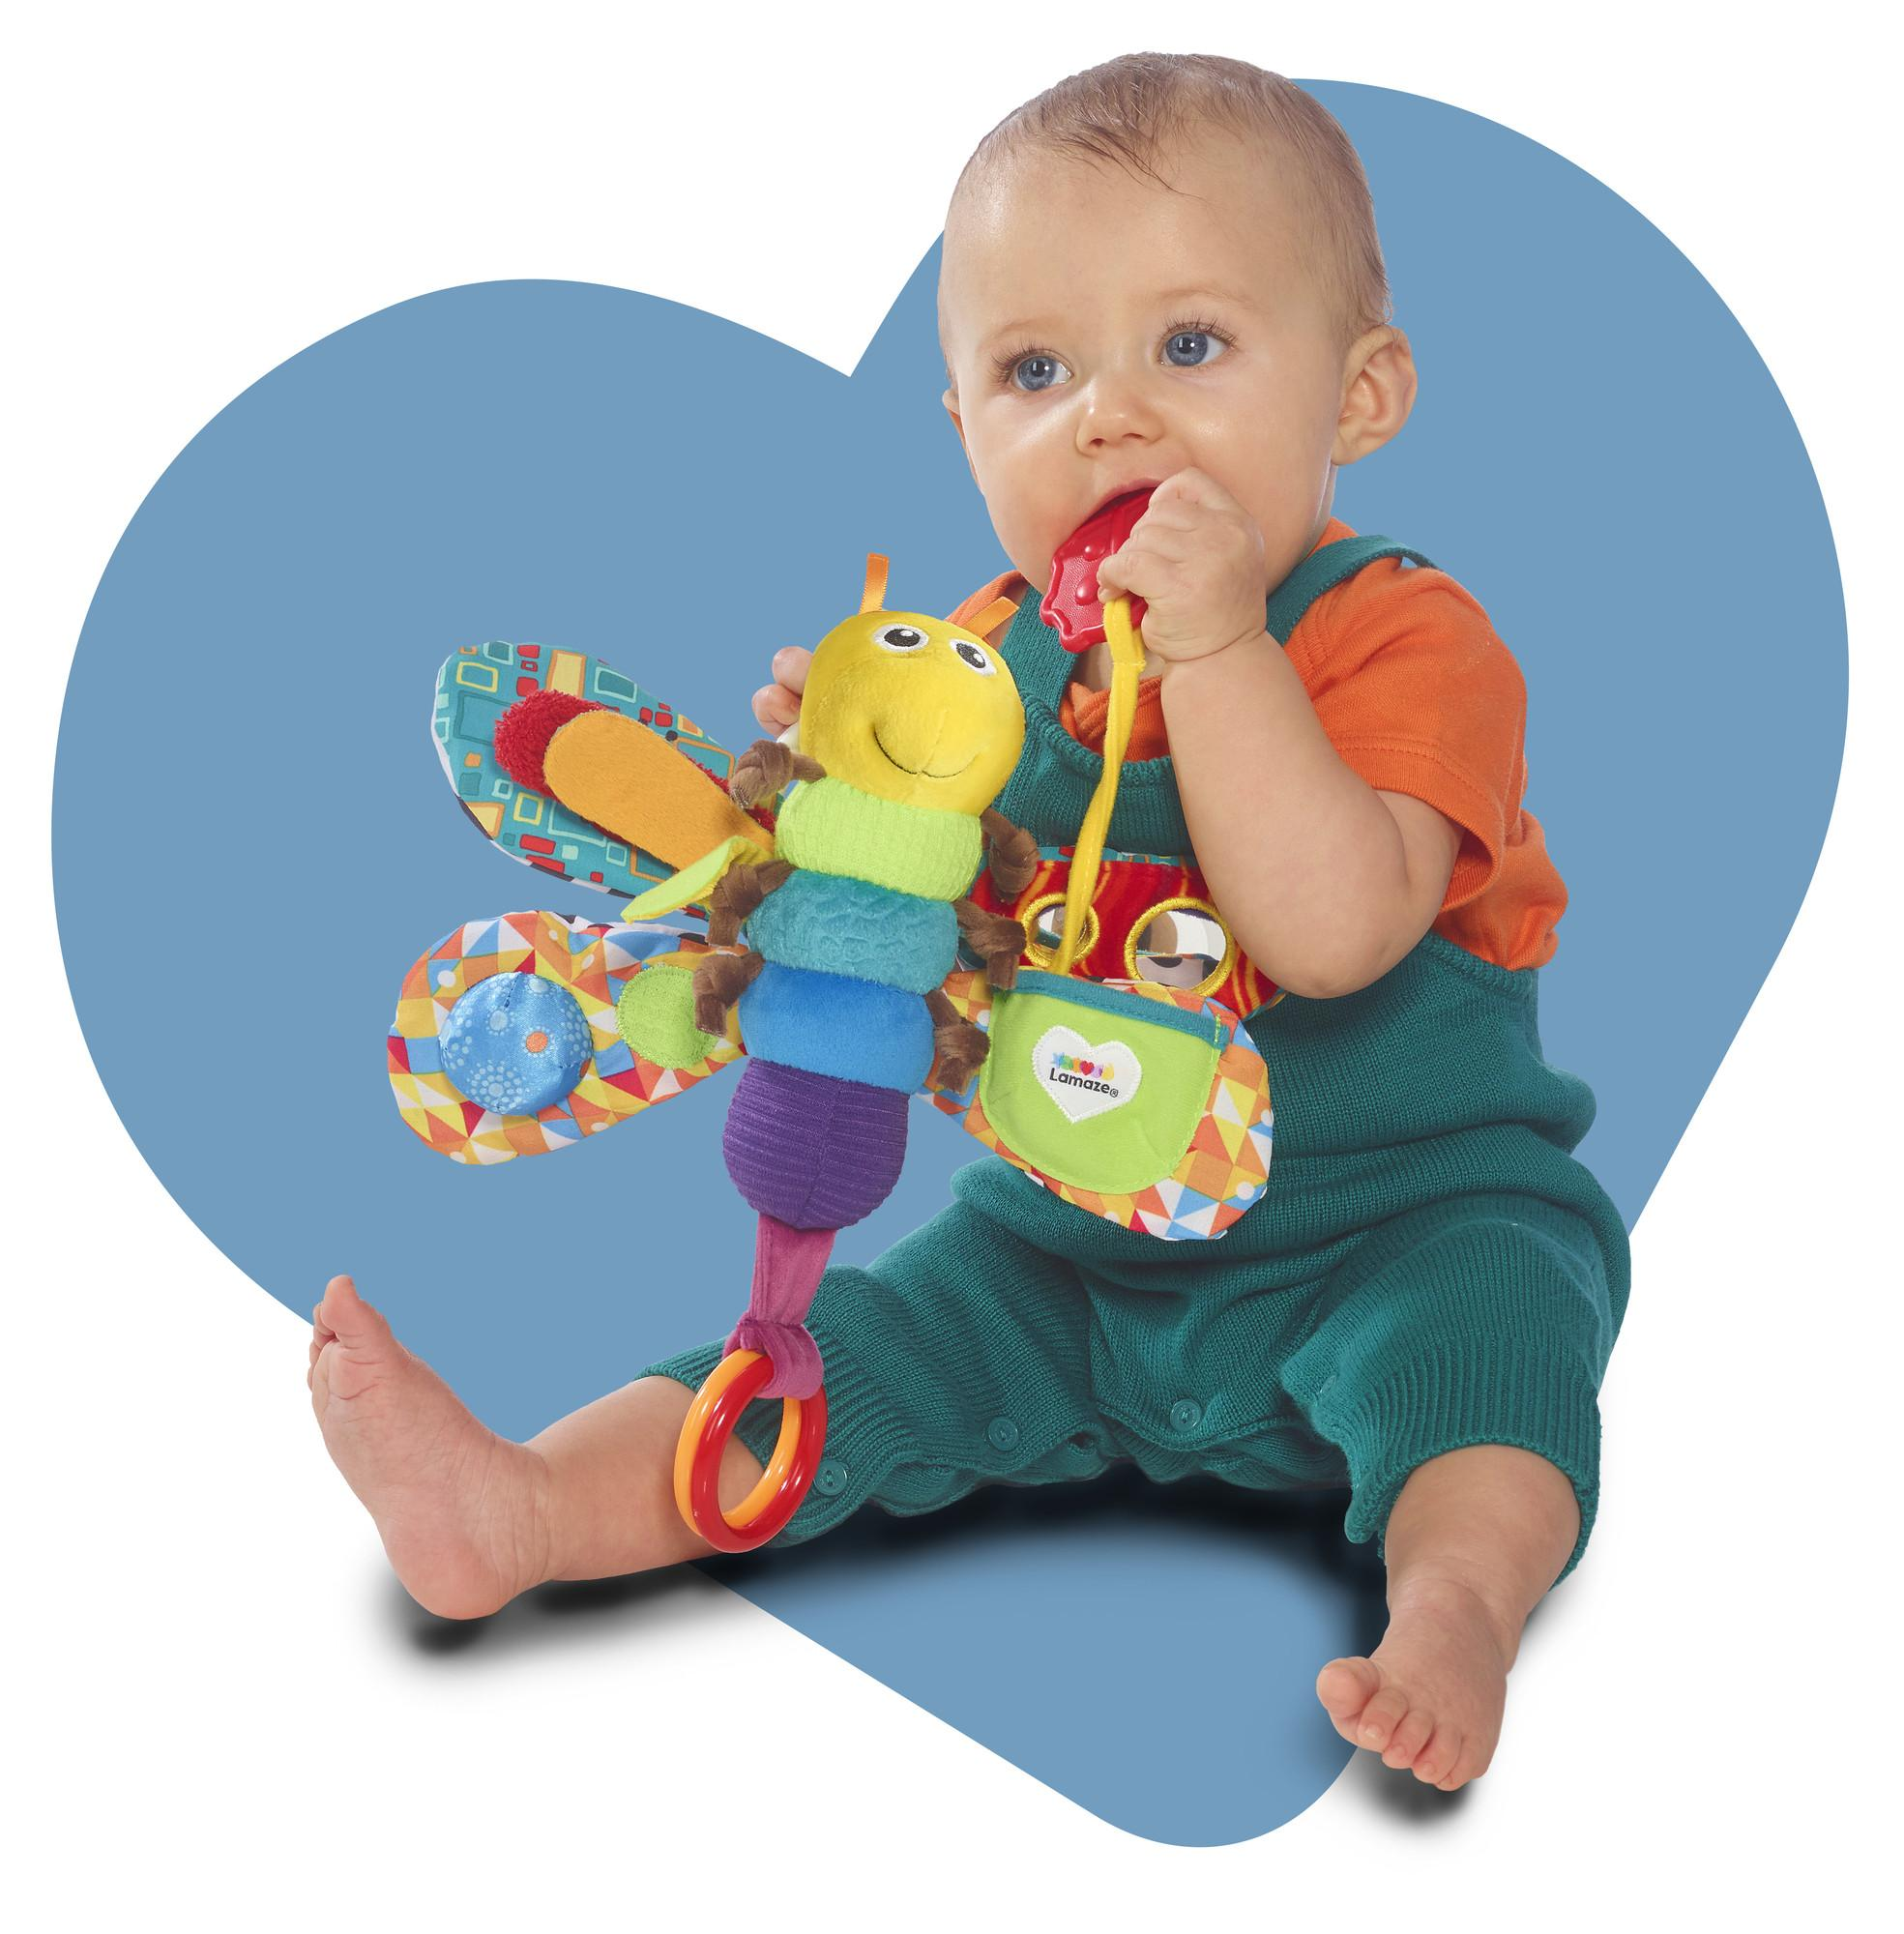 Baby Freddy Toys : Amazon lamaze freddie the firefly baby toys